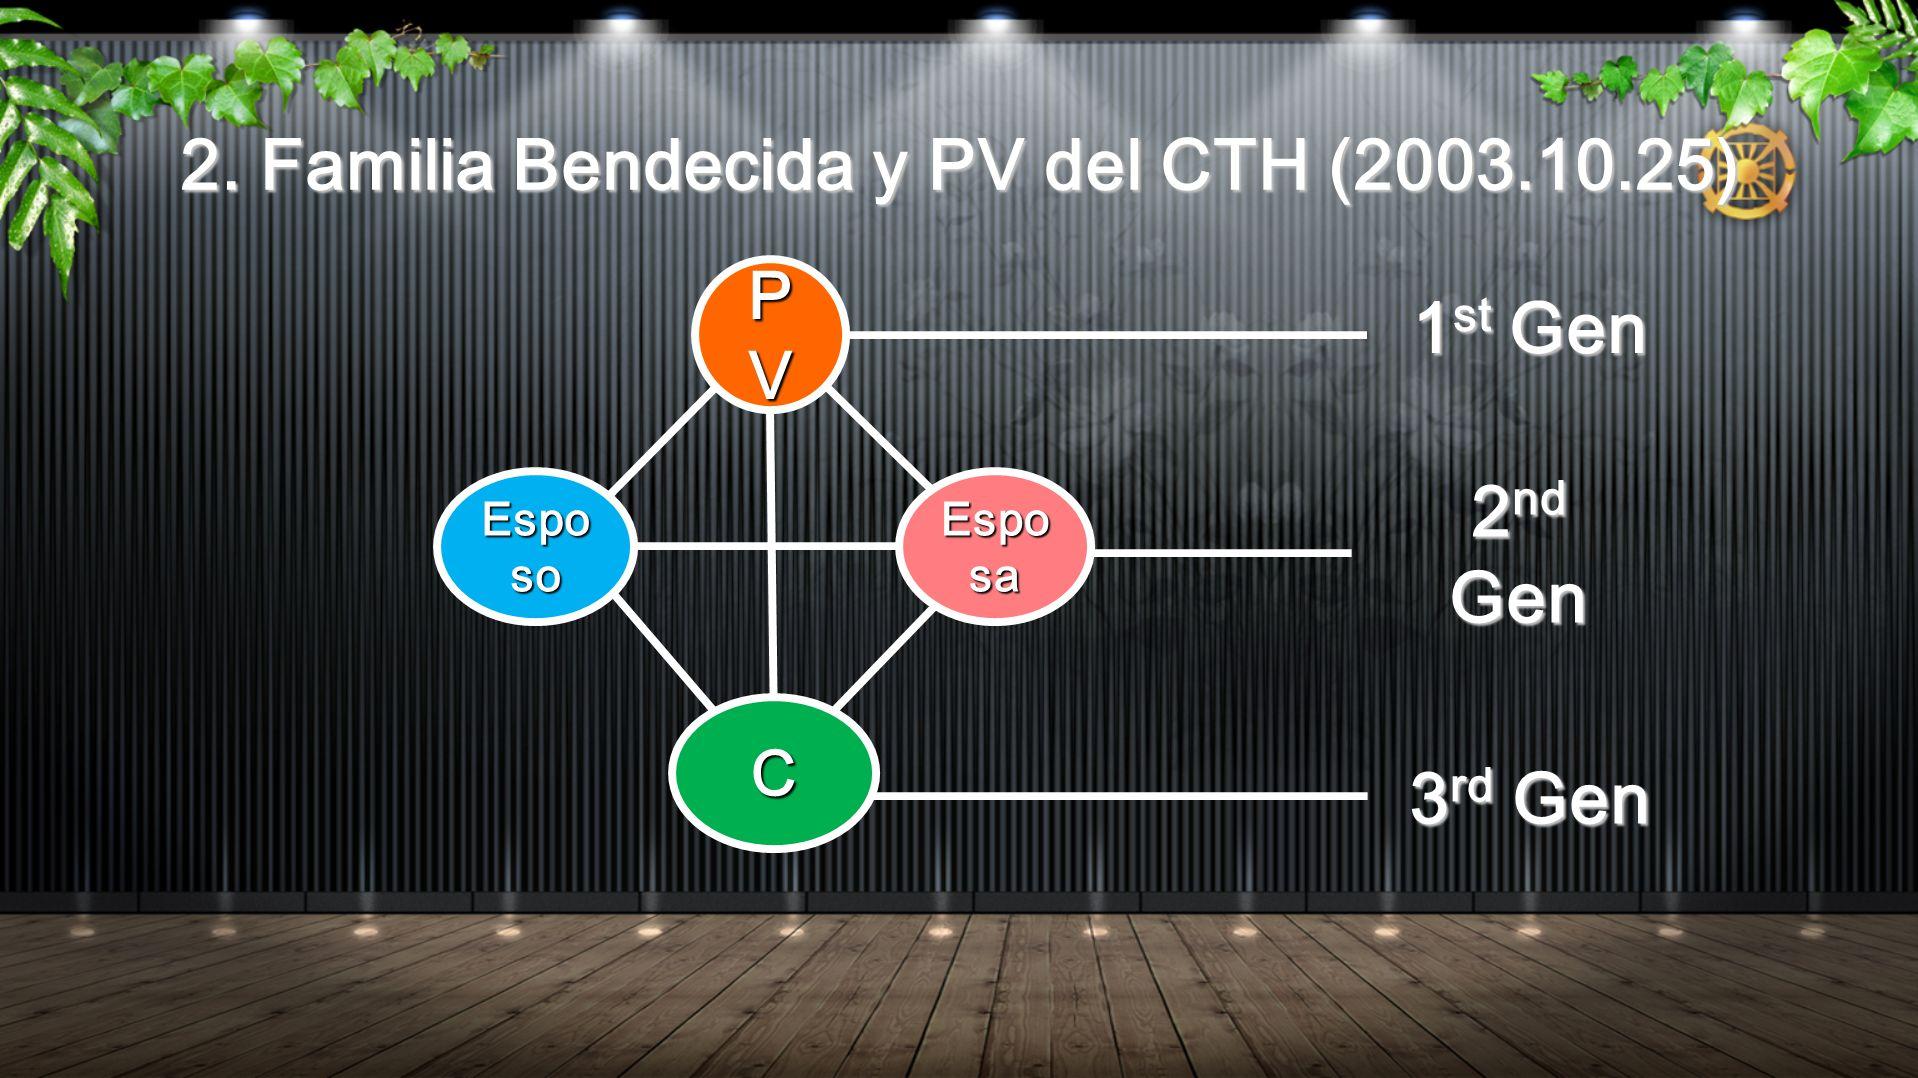 2. Familia Bendecida y PV del CTH (2003.10.25)